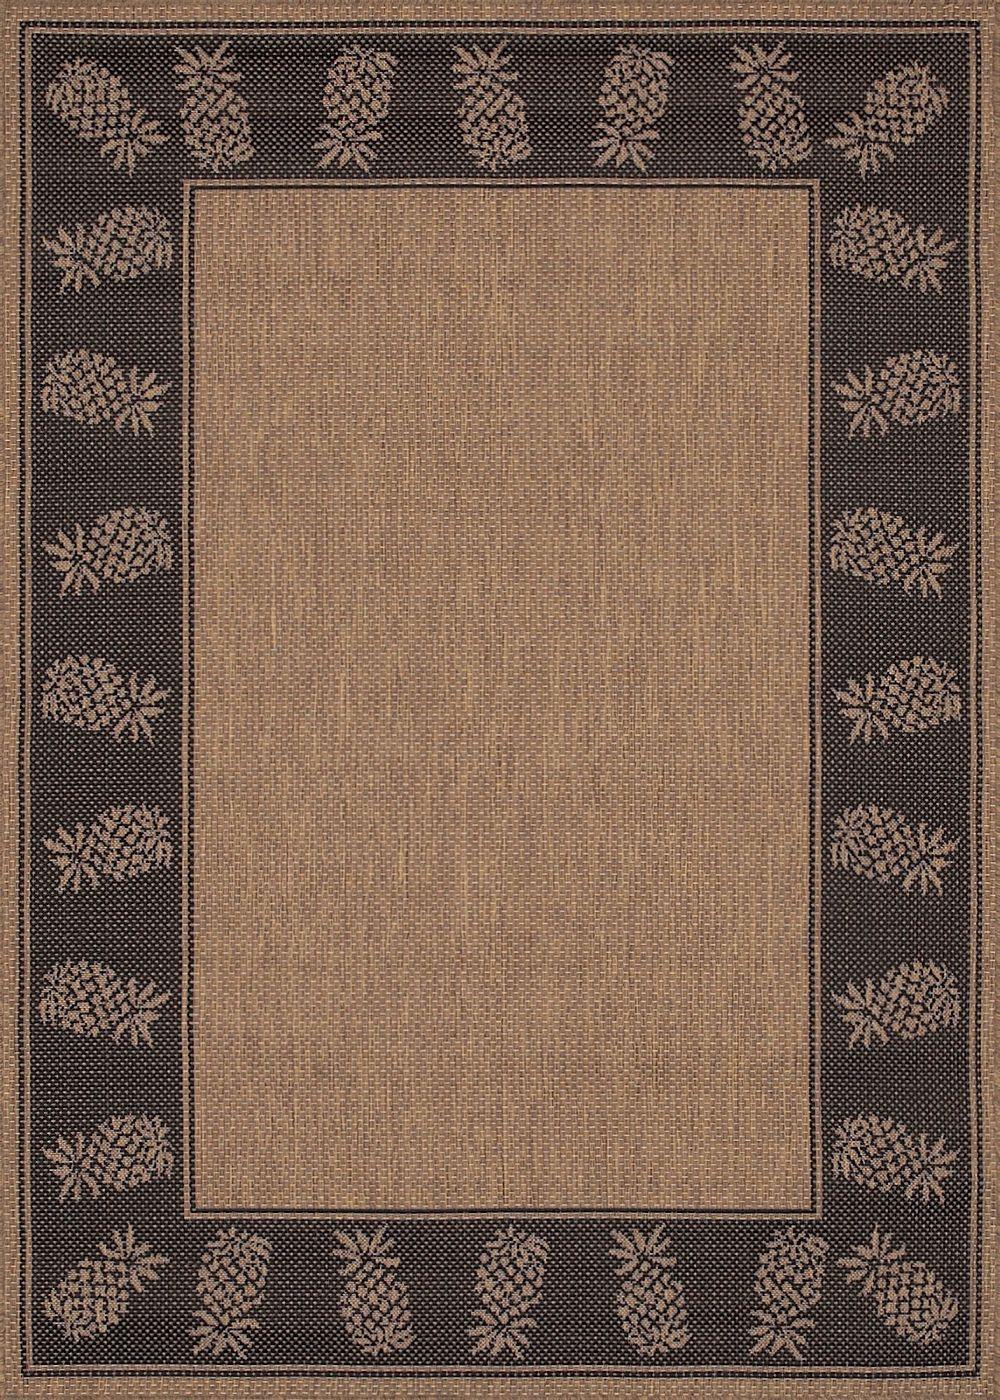 couristan recife novelty area rug collection